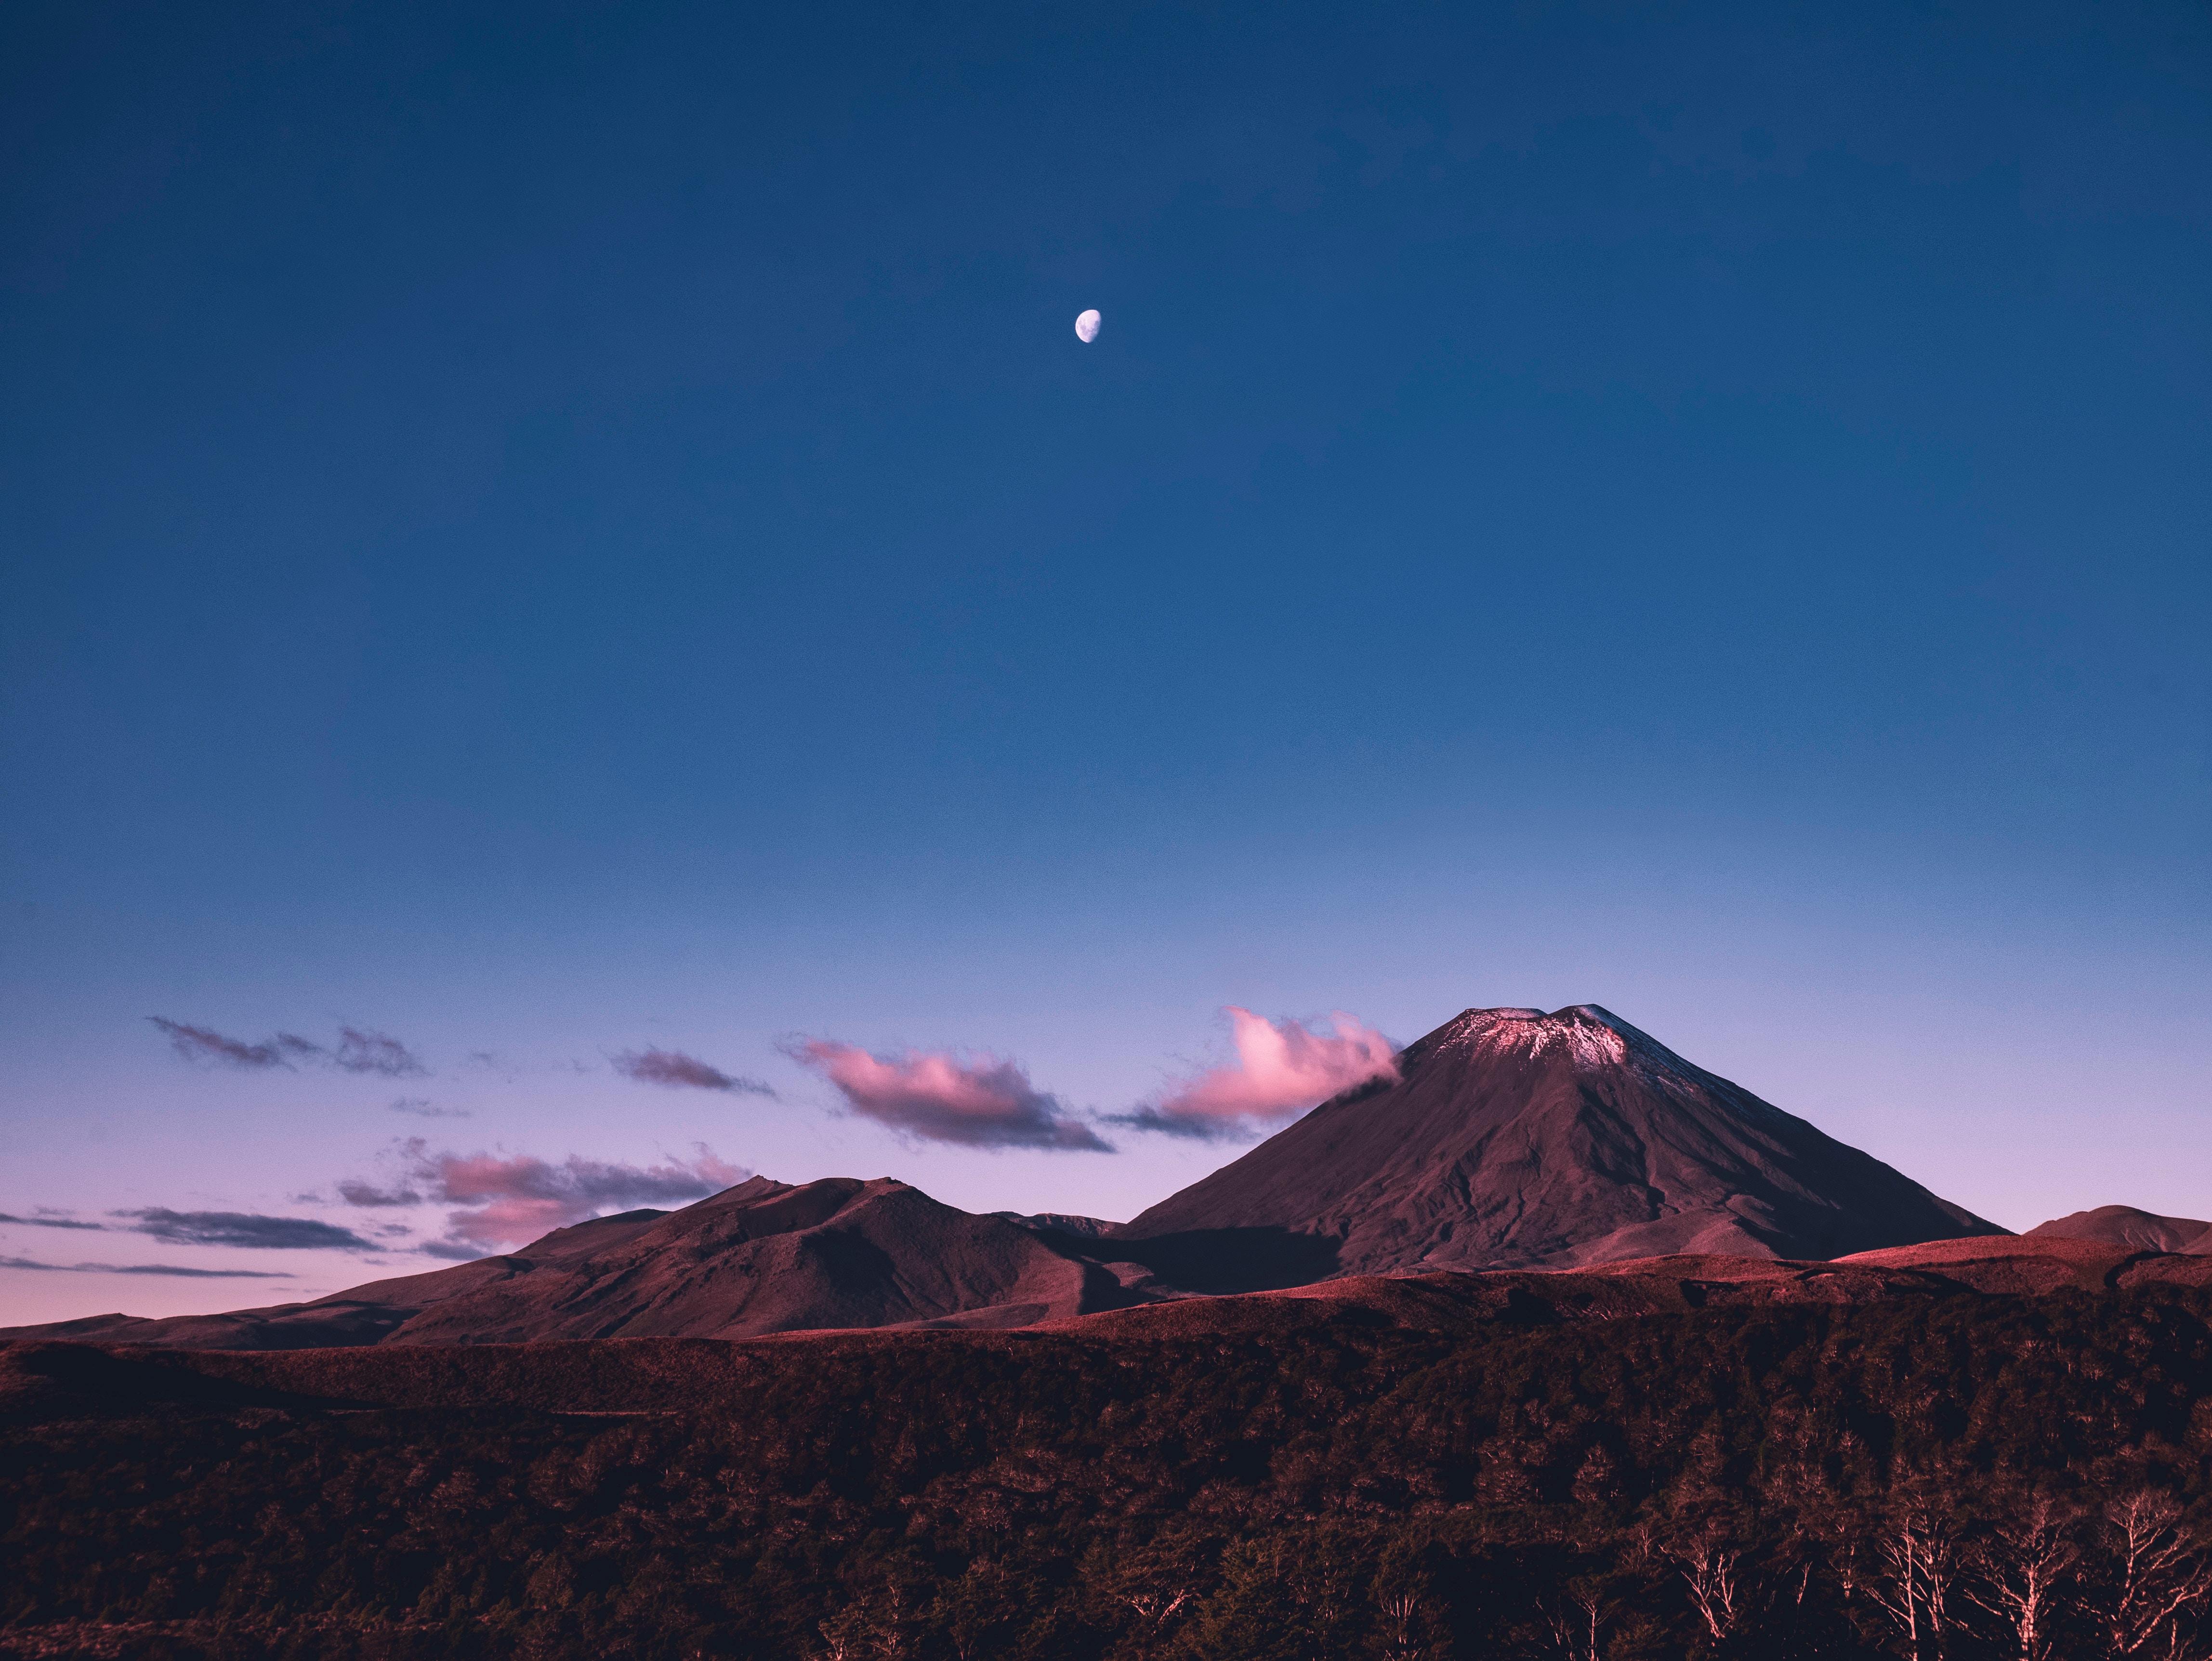 General 4592x3448 landscape nature New Zealand Tongariro National Park volcano